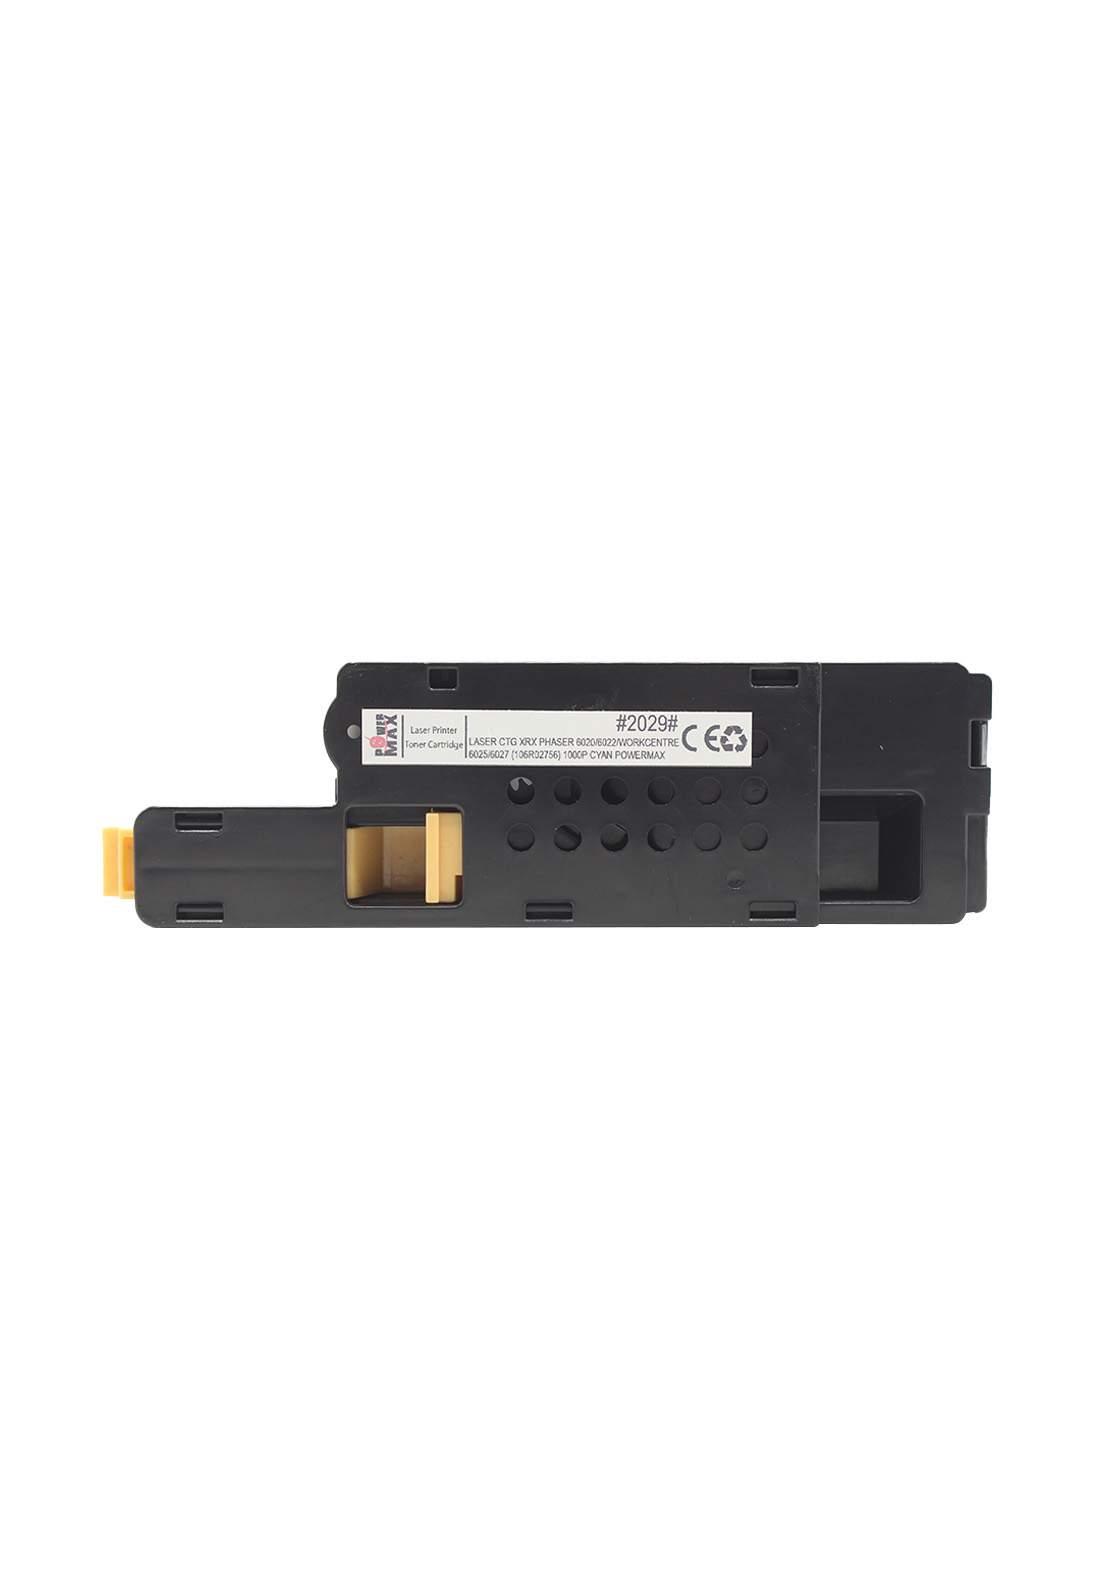 Power Max CTG Xerox Phaser 6020/6022 / Workcentre 6025/6027 (106R02756) 1000P Laser Printer Toner Cartridge خرطوشة حبر